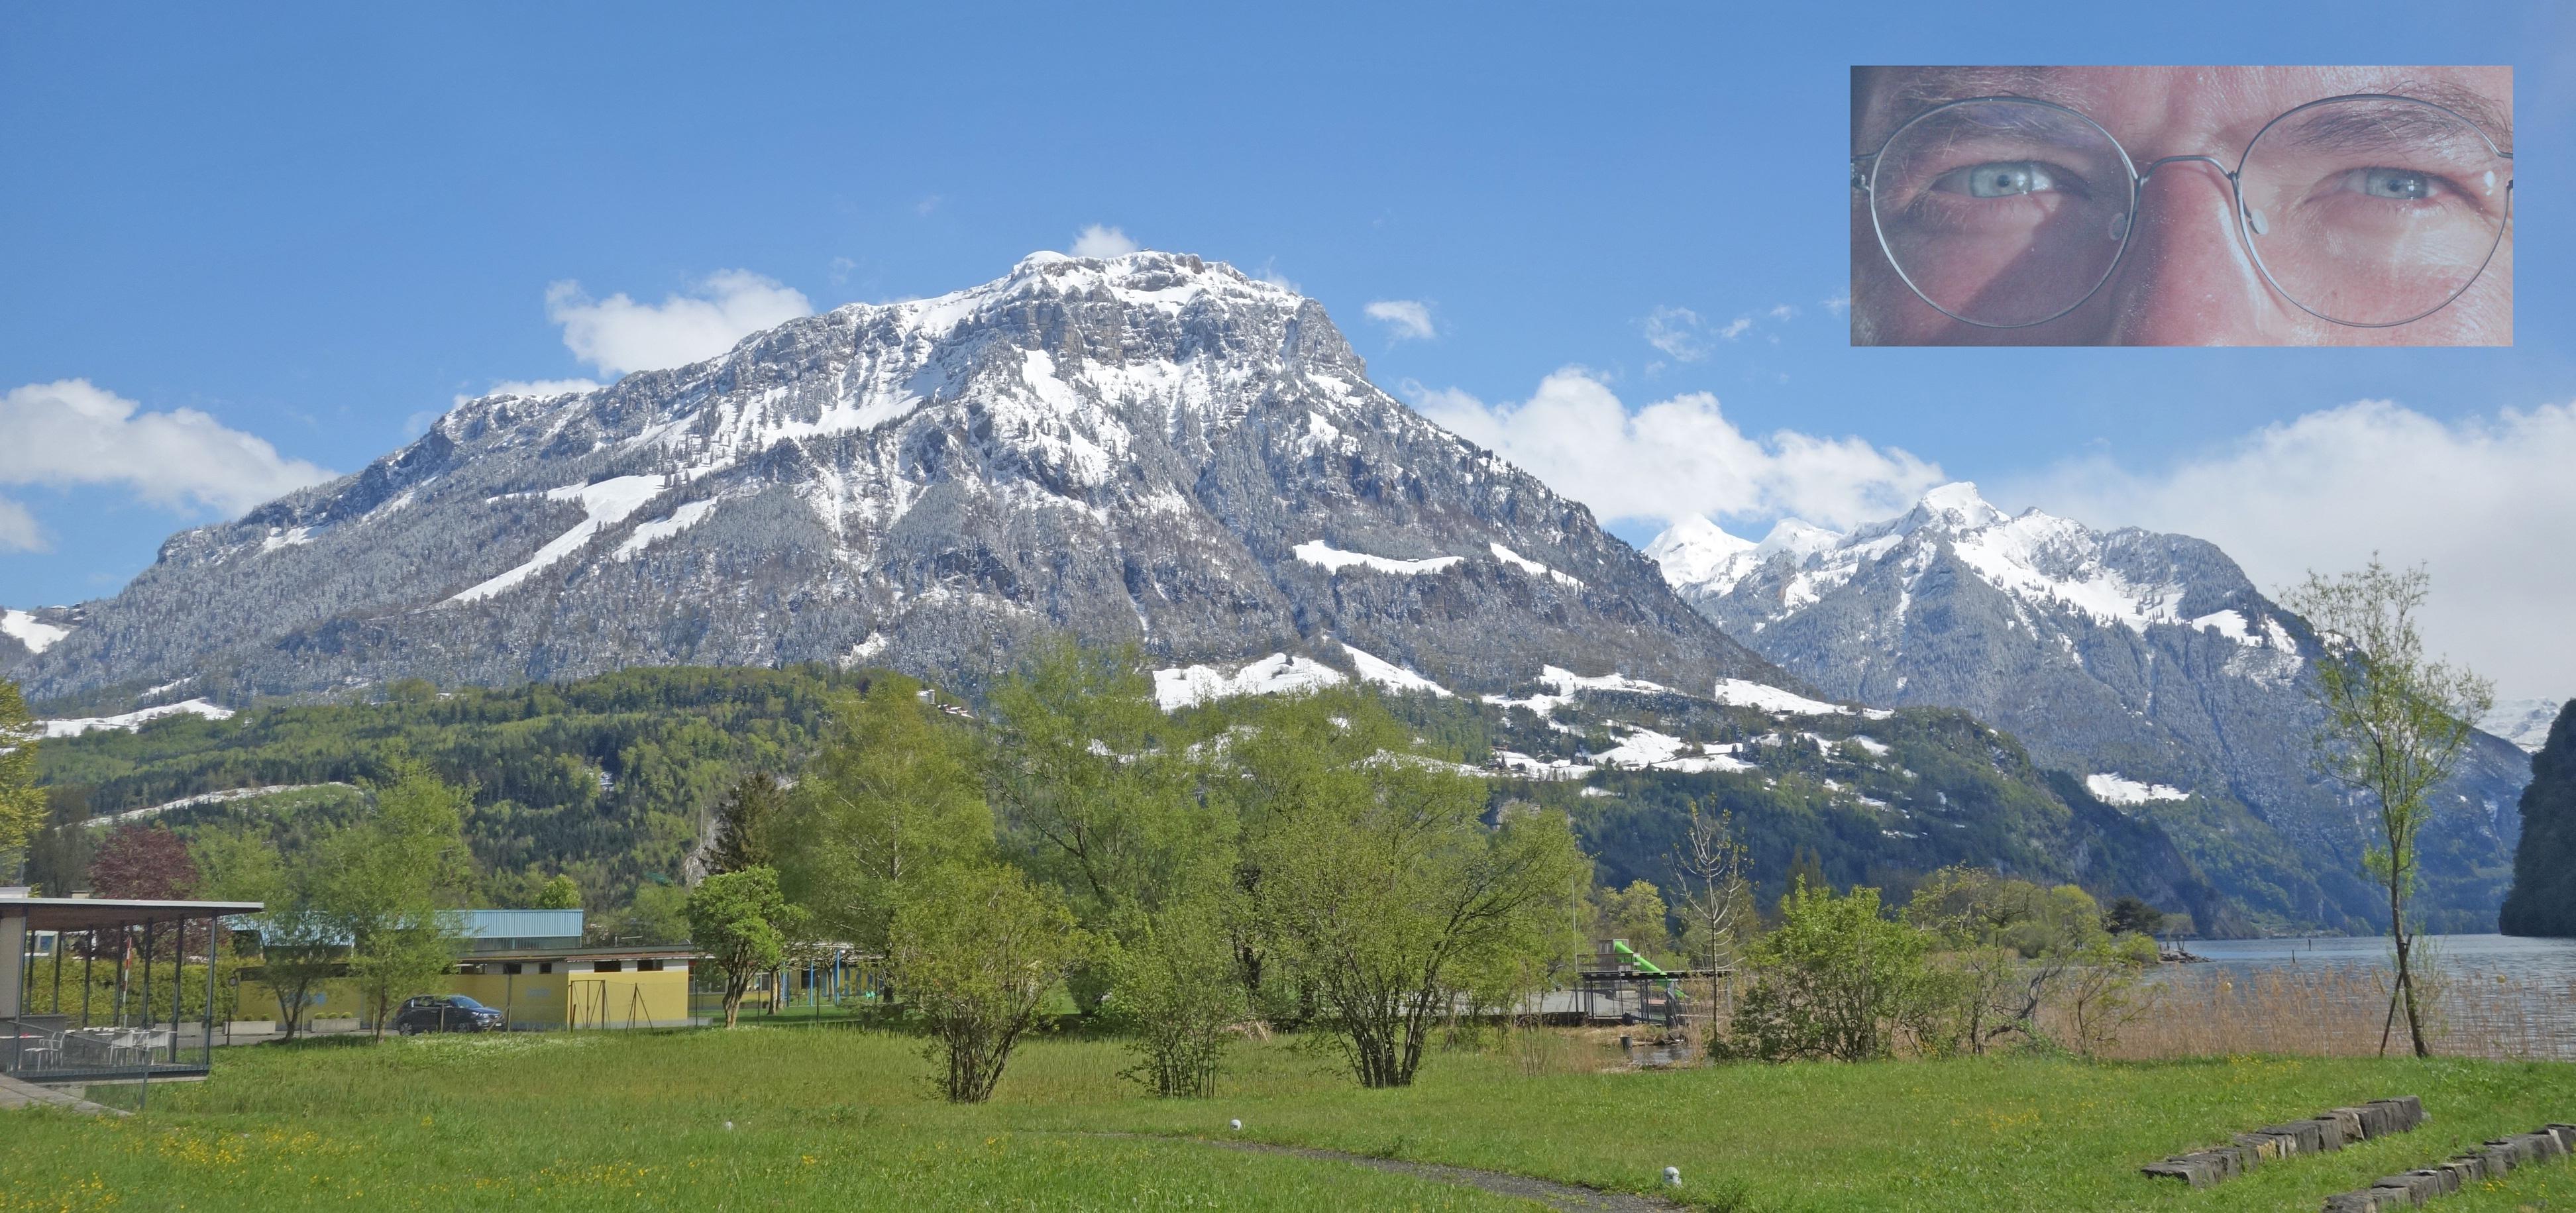 http://www.volker-goebel.biz/Ing_Goebel_plante_vom_Standort_Schweiz_aus_.jpg